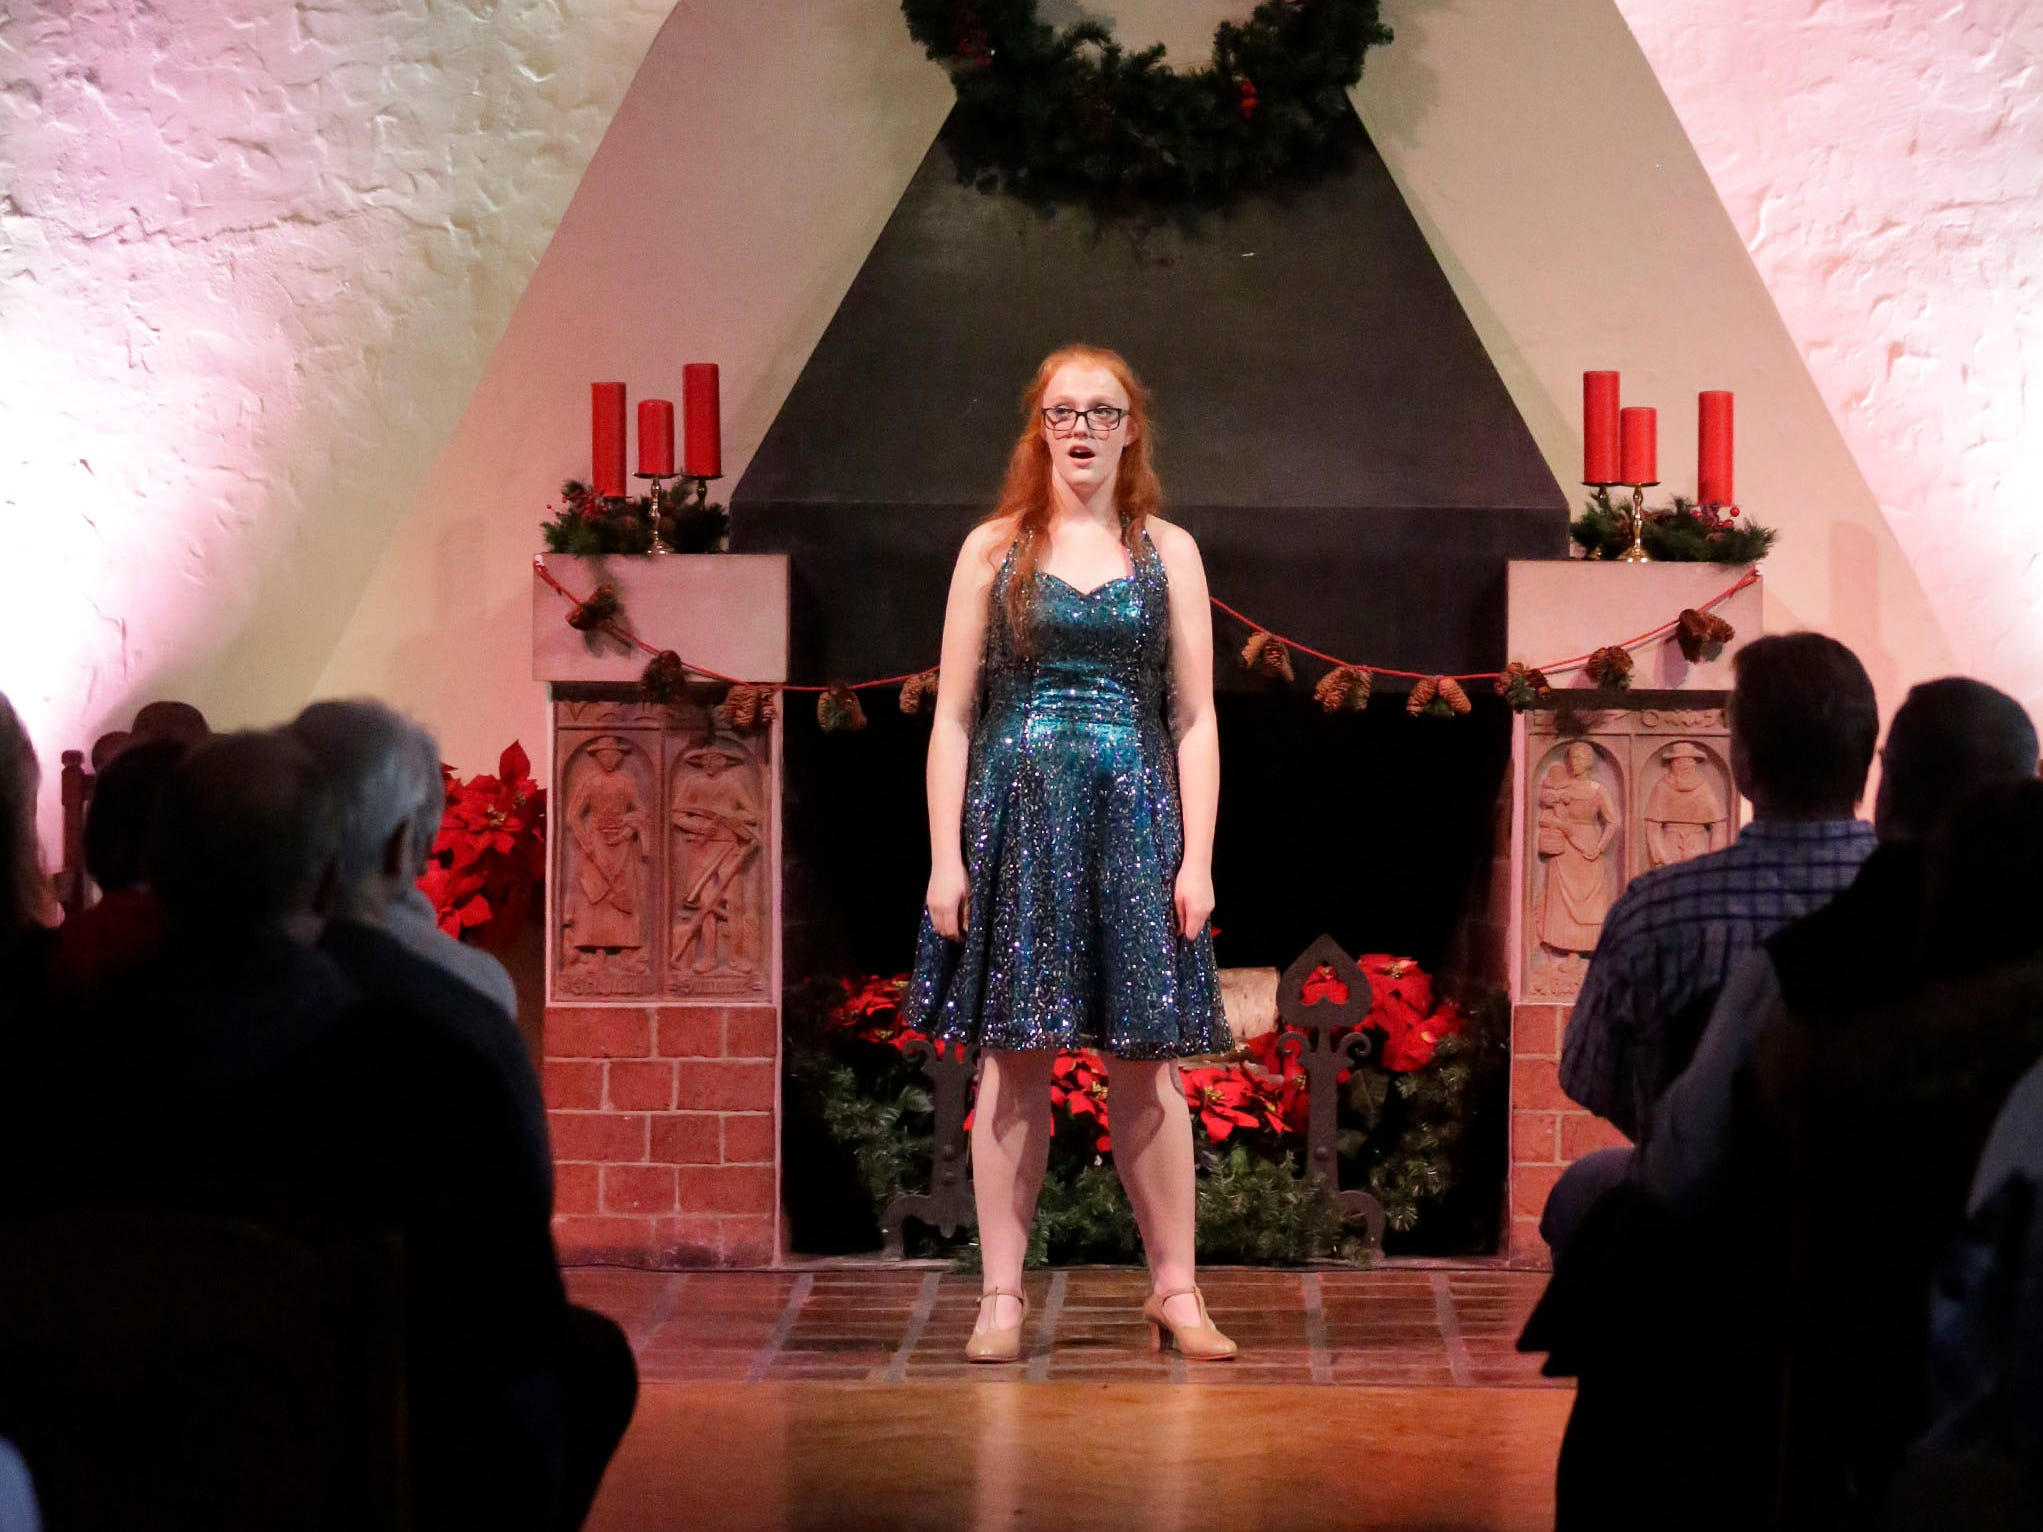 A Waves of Rhythm Show Choir from Kiel High School singer performs at the Waelderhaus, Saturday, December 8, 2018, in Kohler, Wis.